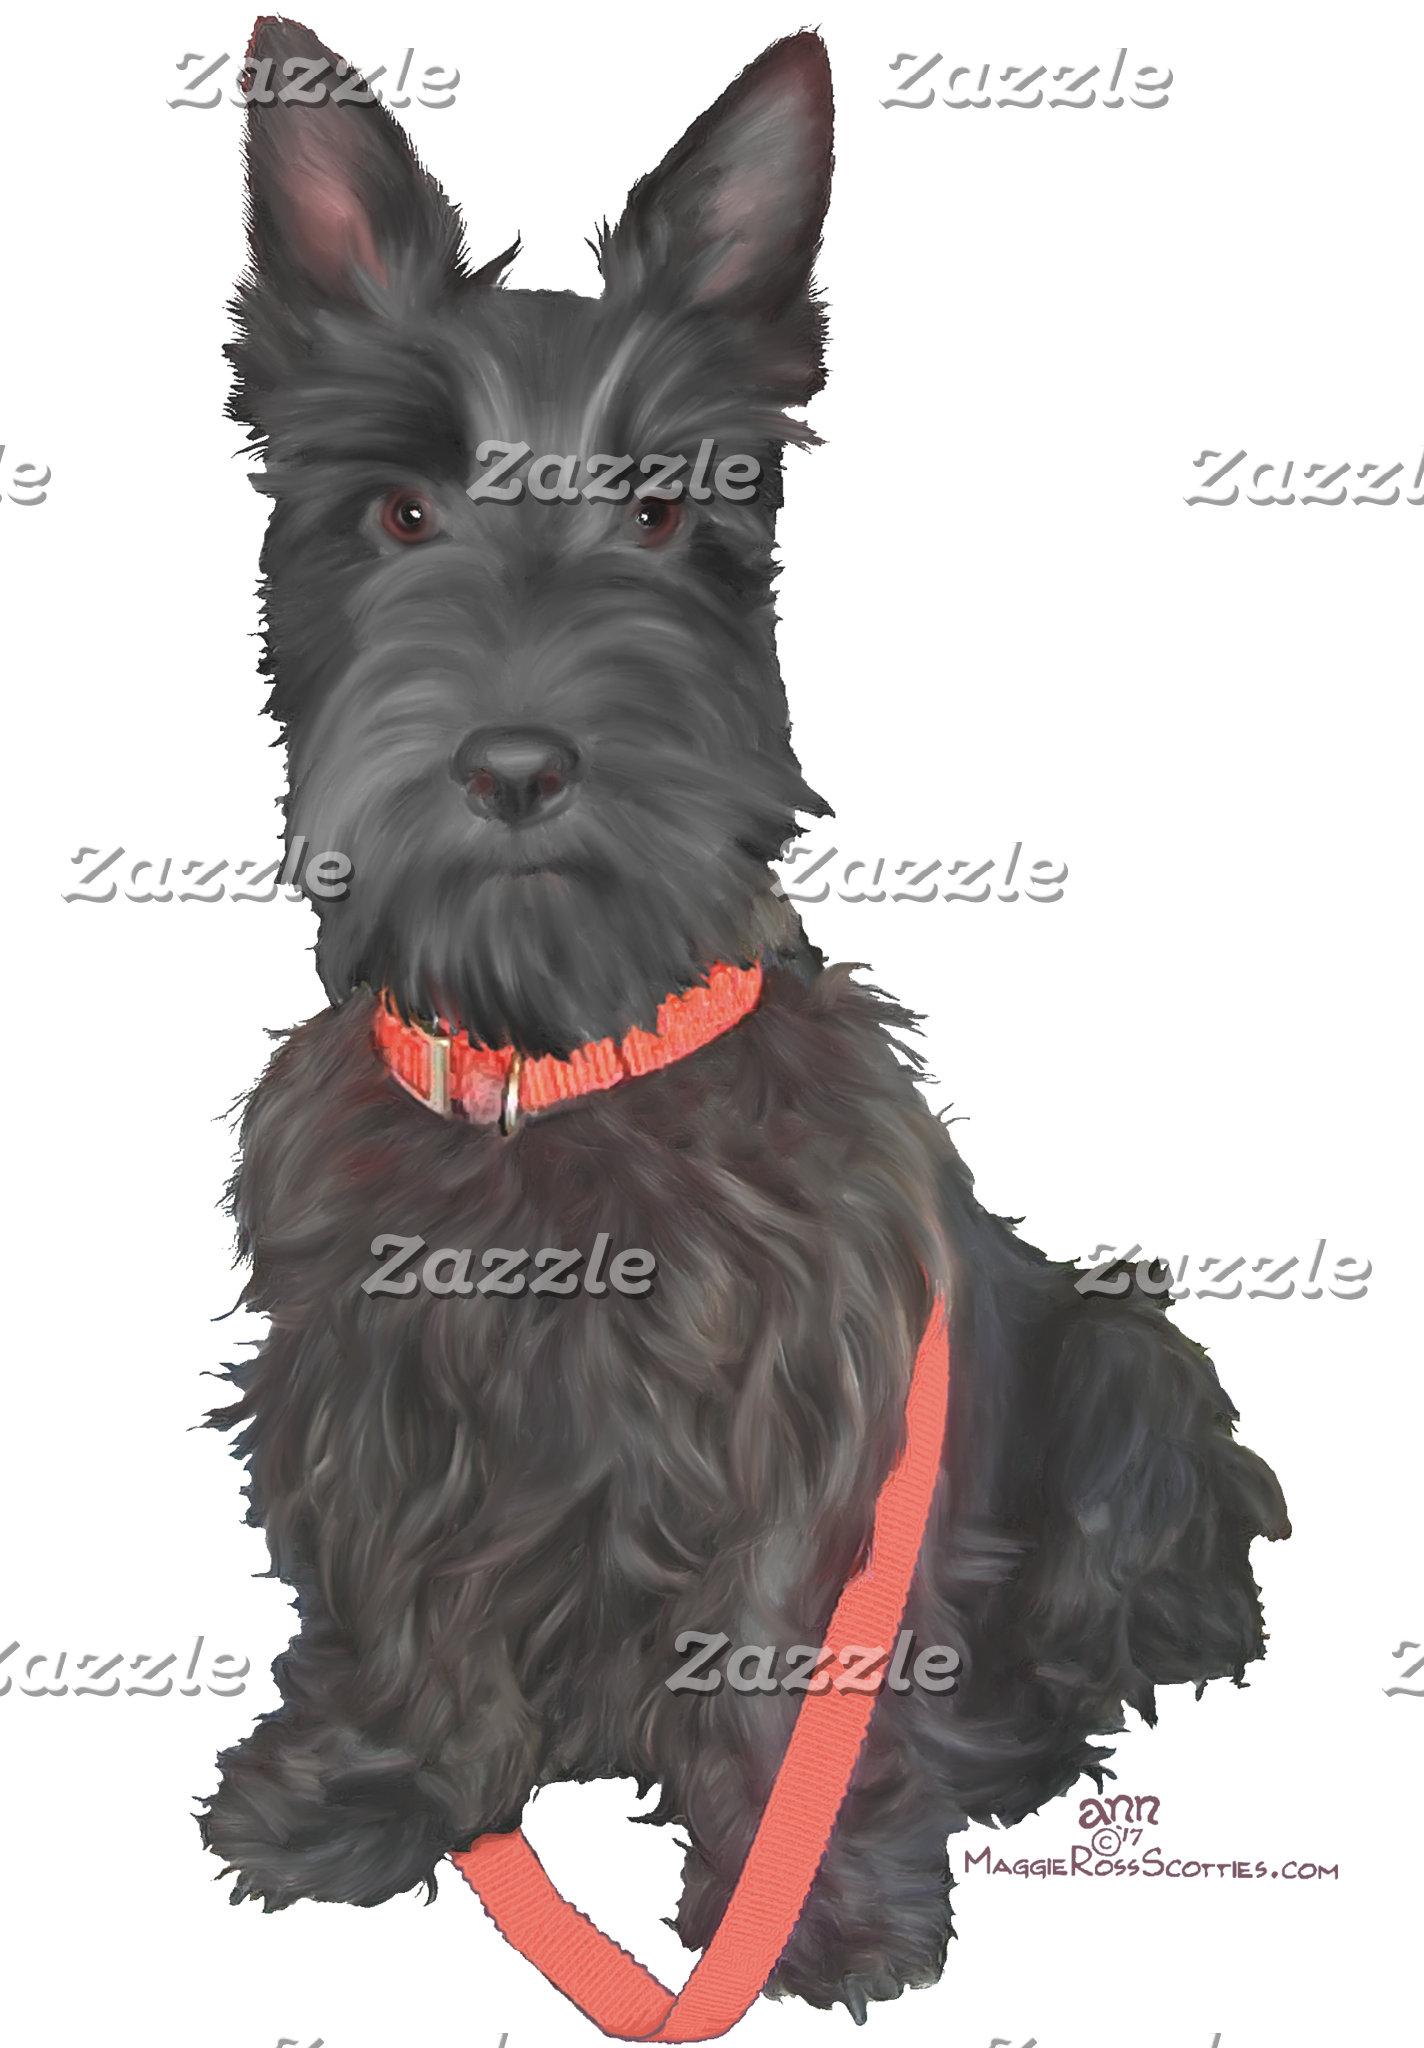 Scottish Terrier in Red Collar